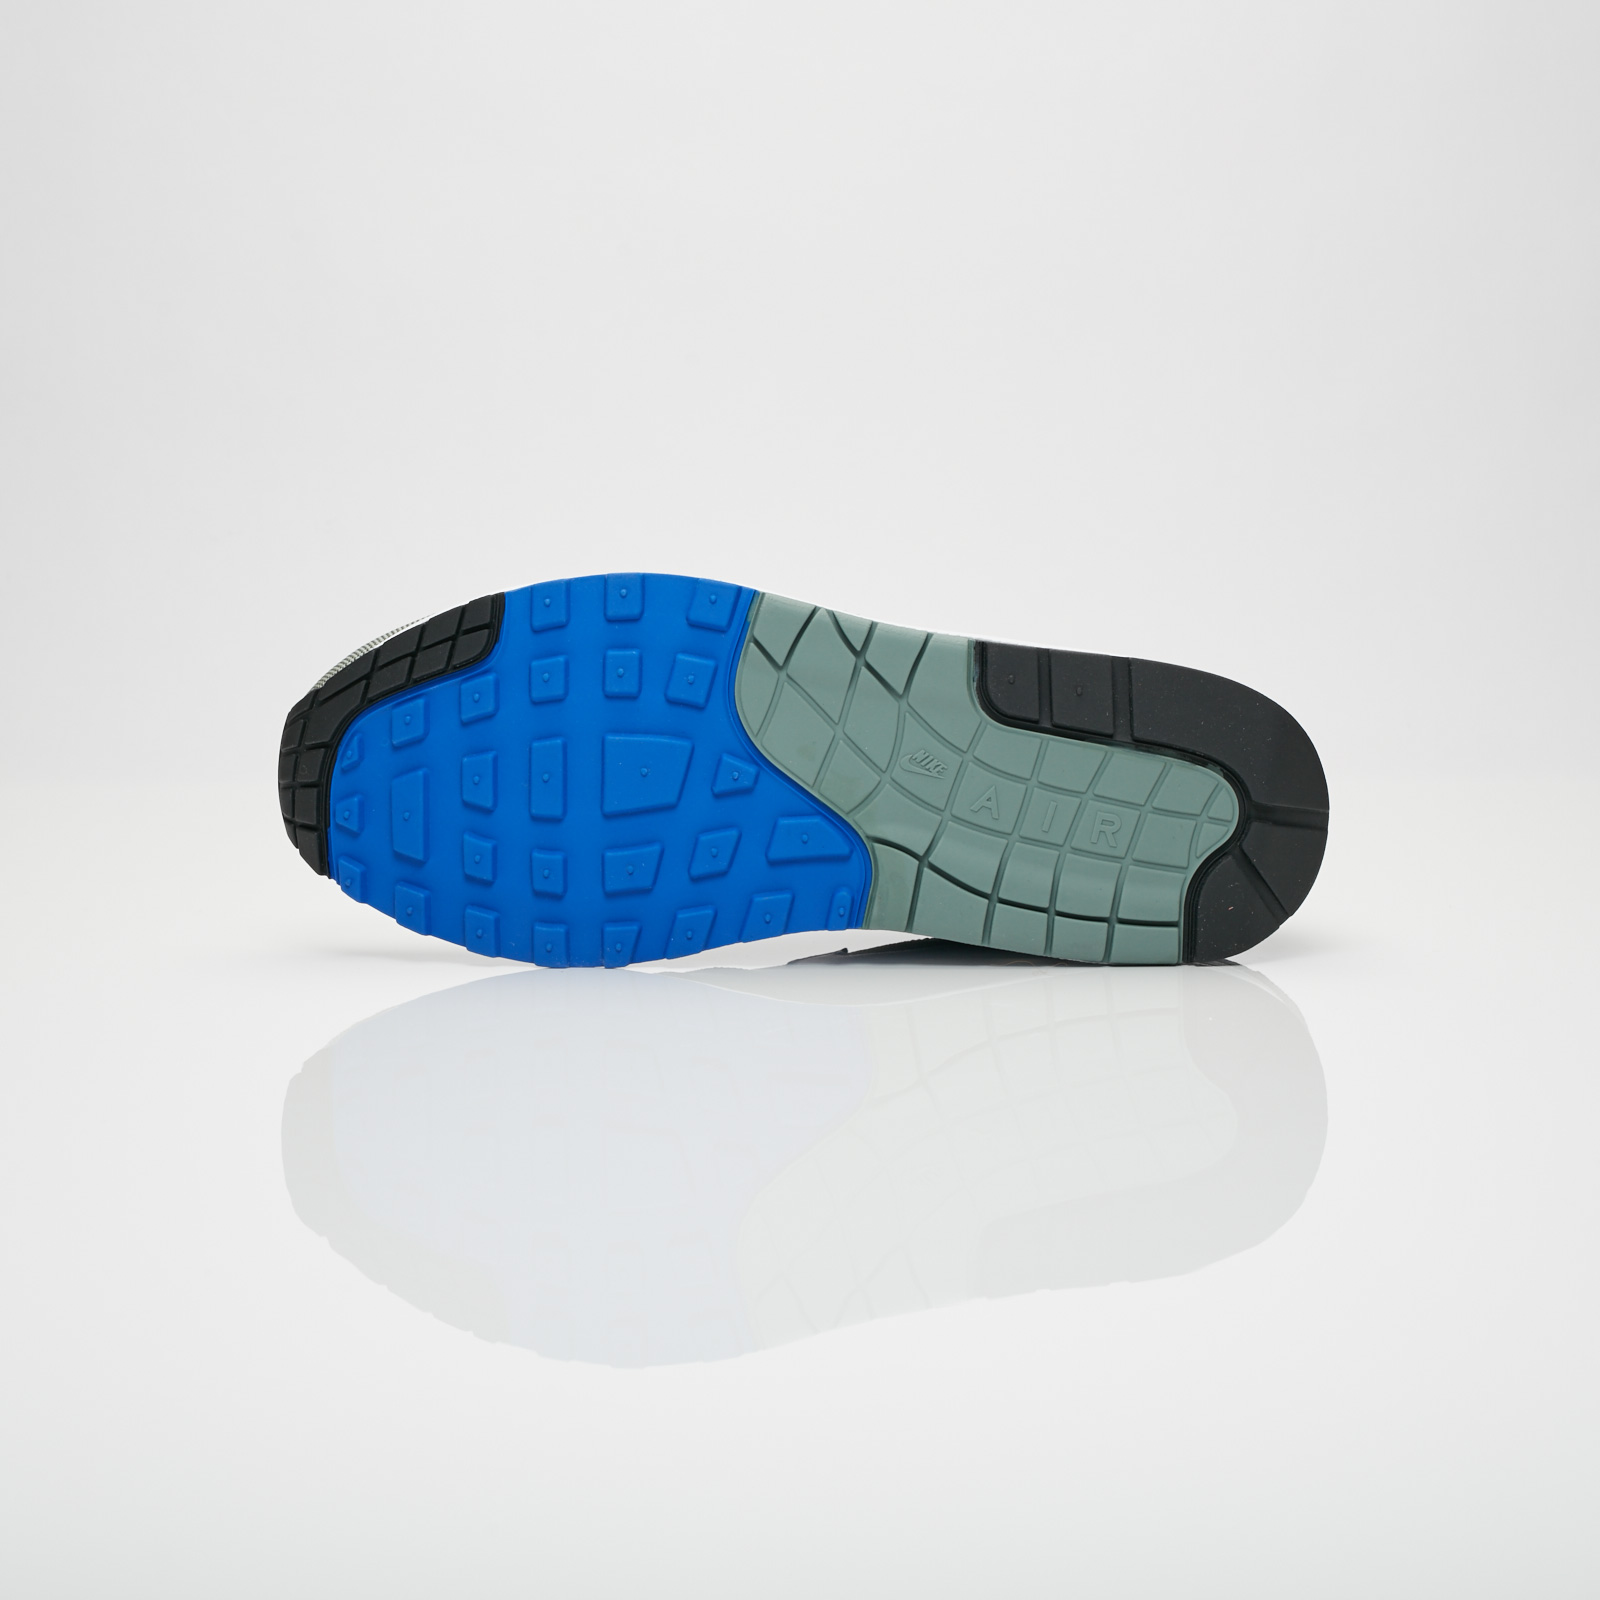 Nike Air 875844 Max 1 Premium 875844 Air 300 Zapatillasnstuff Zapatillas 961ac2